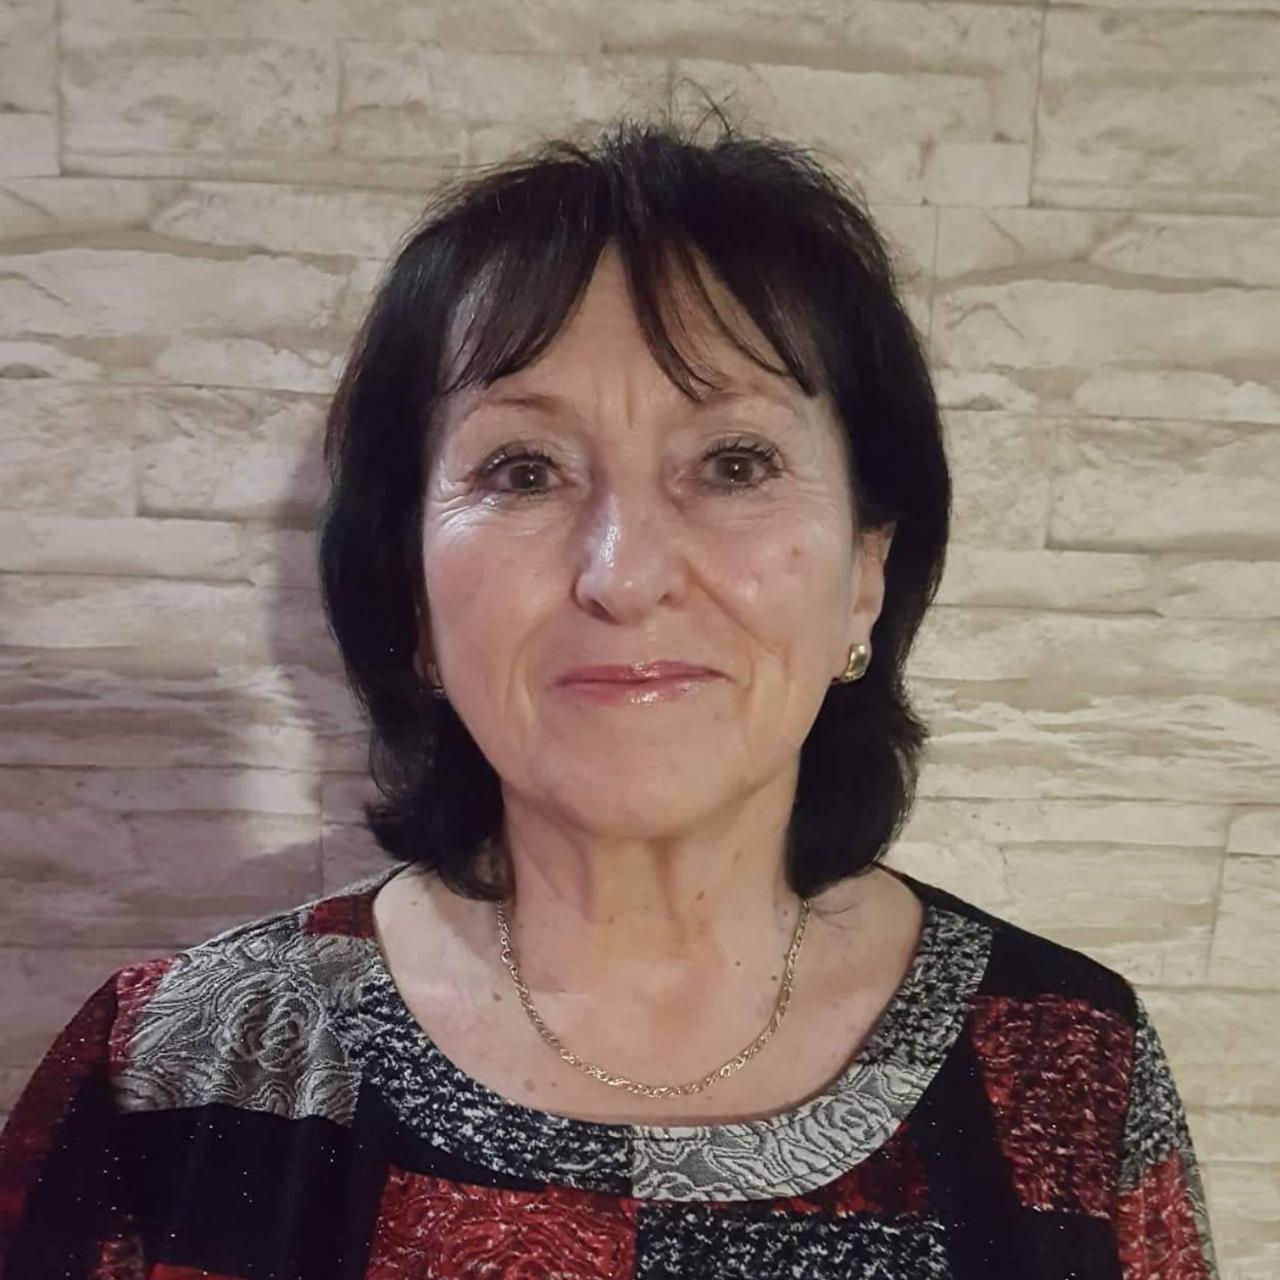 Hana Rudová